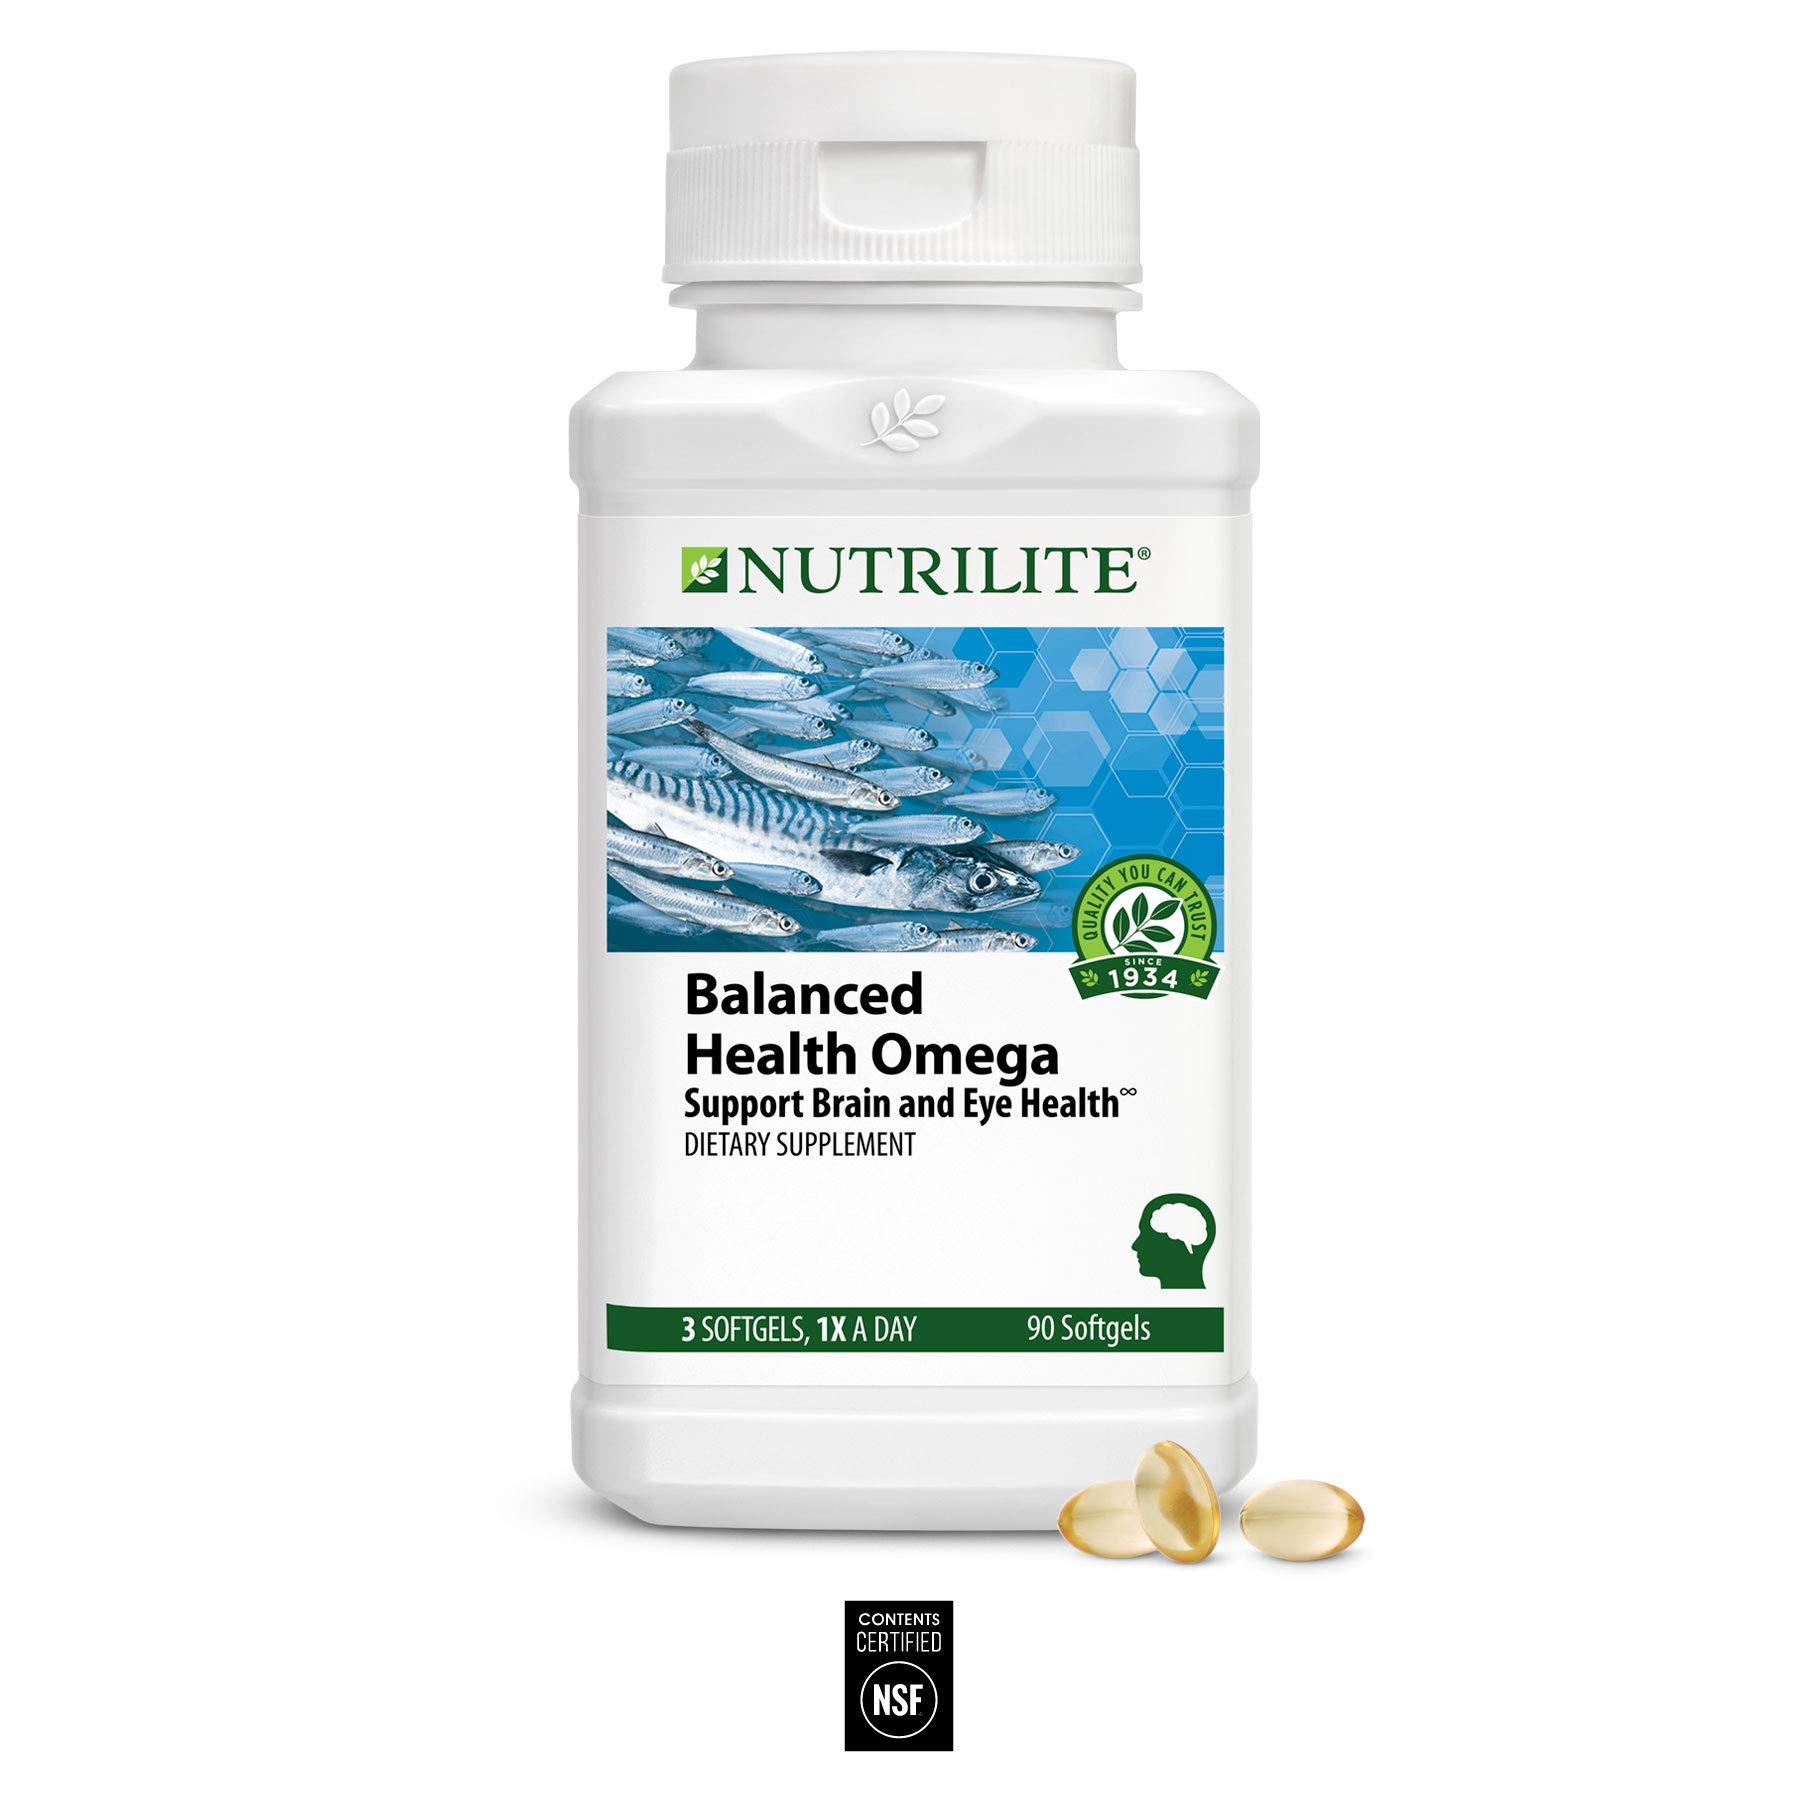 Nutrilite Balanced Health Omega 90 Softgels